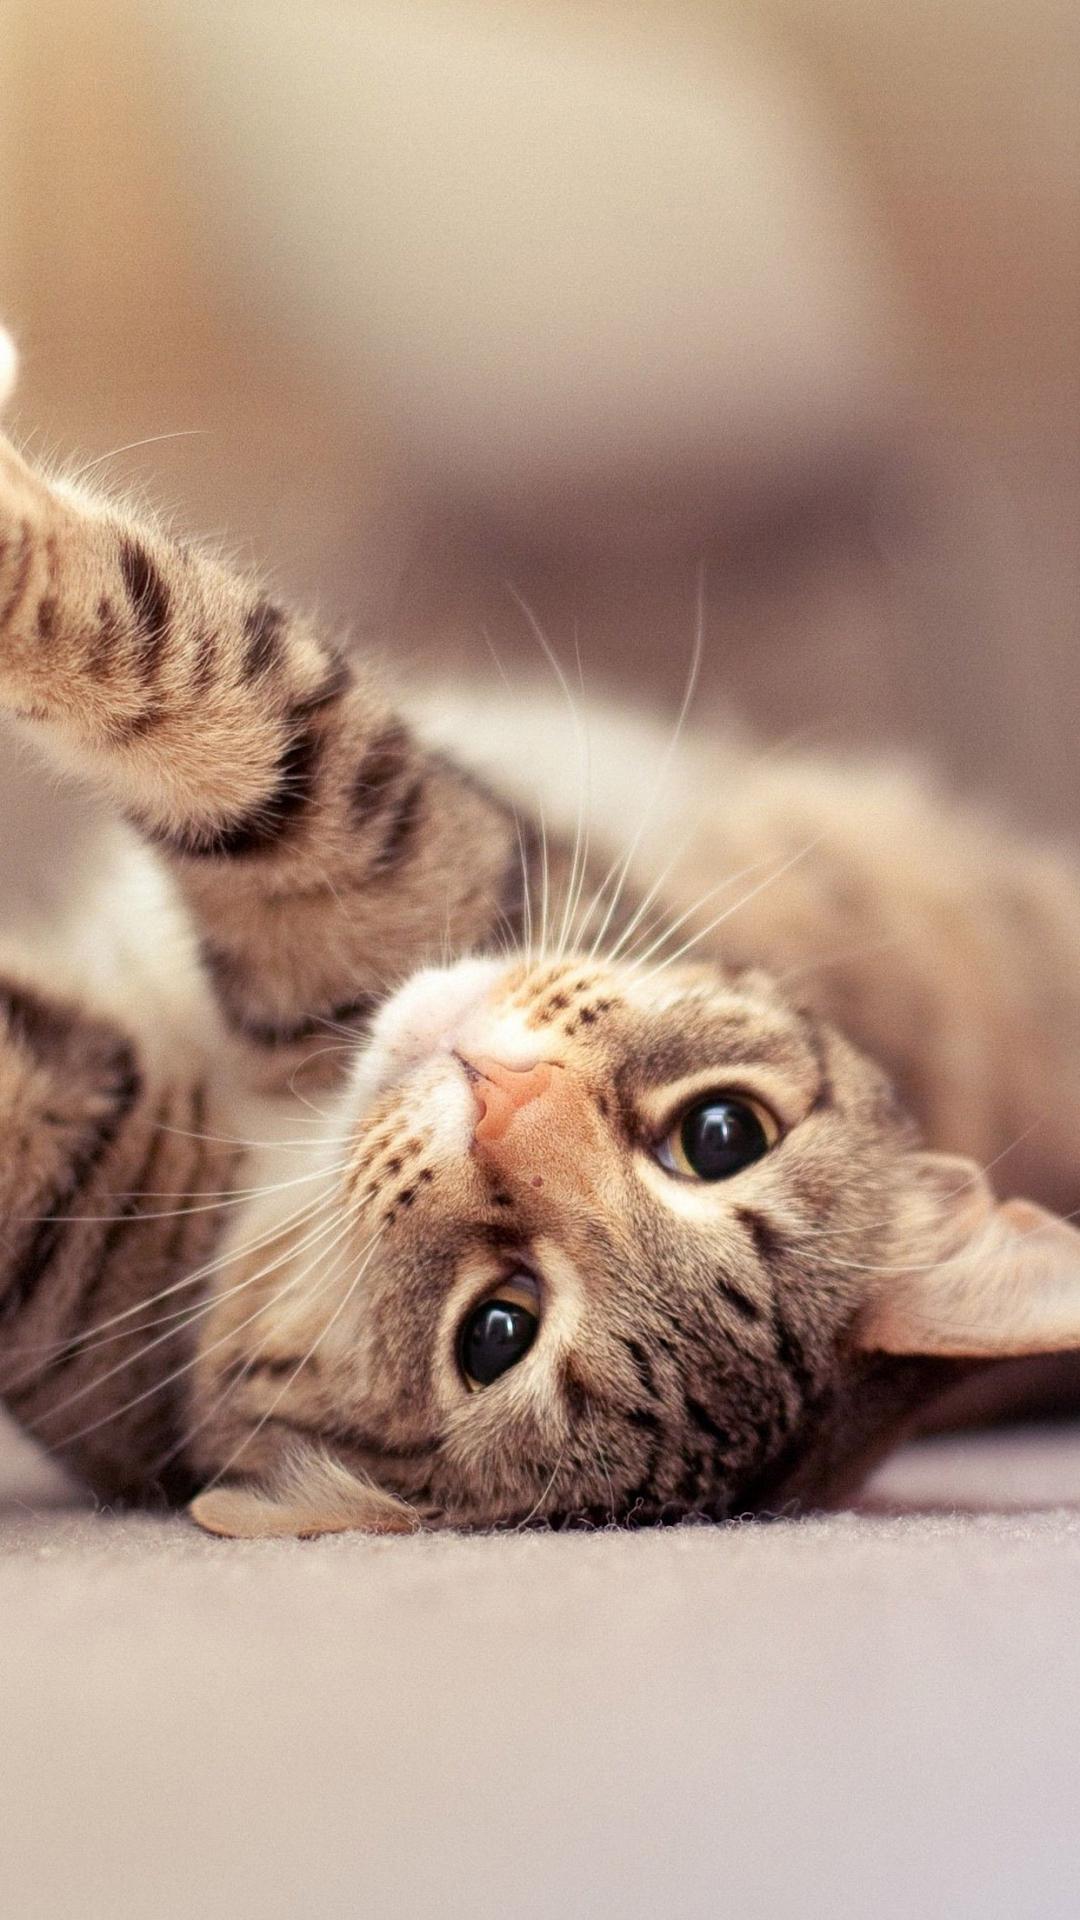 Cute Baby Pics For Whatsapp Wallpaper Cat Iphone Backgrounds Pixelstalk Net